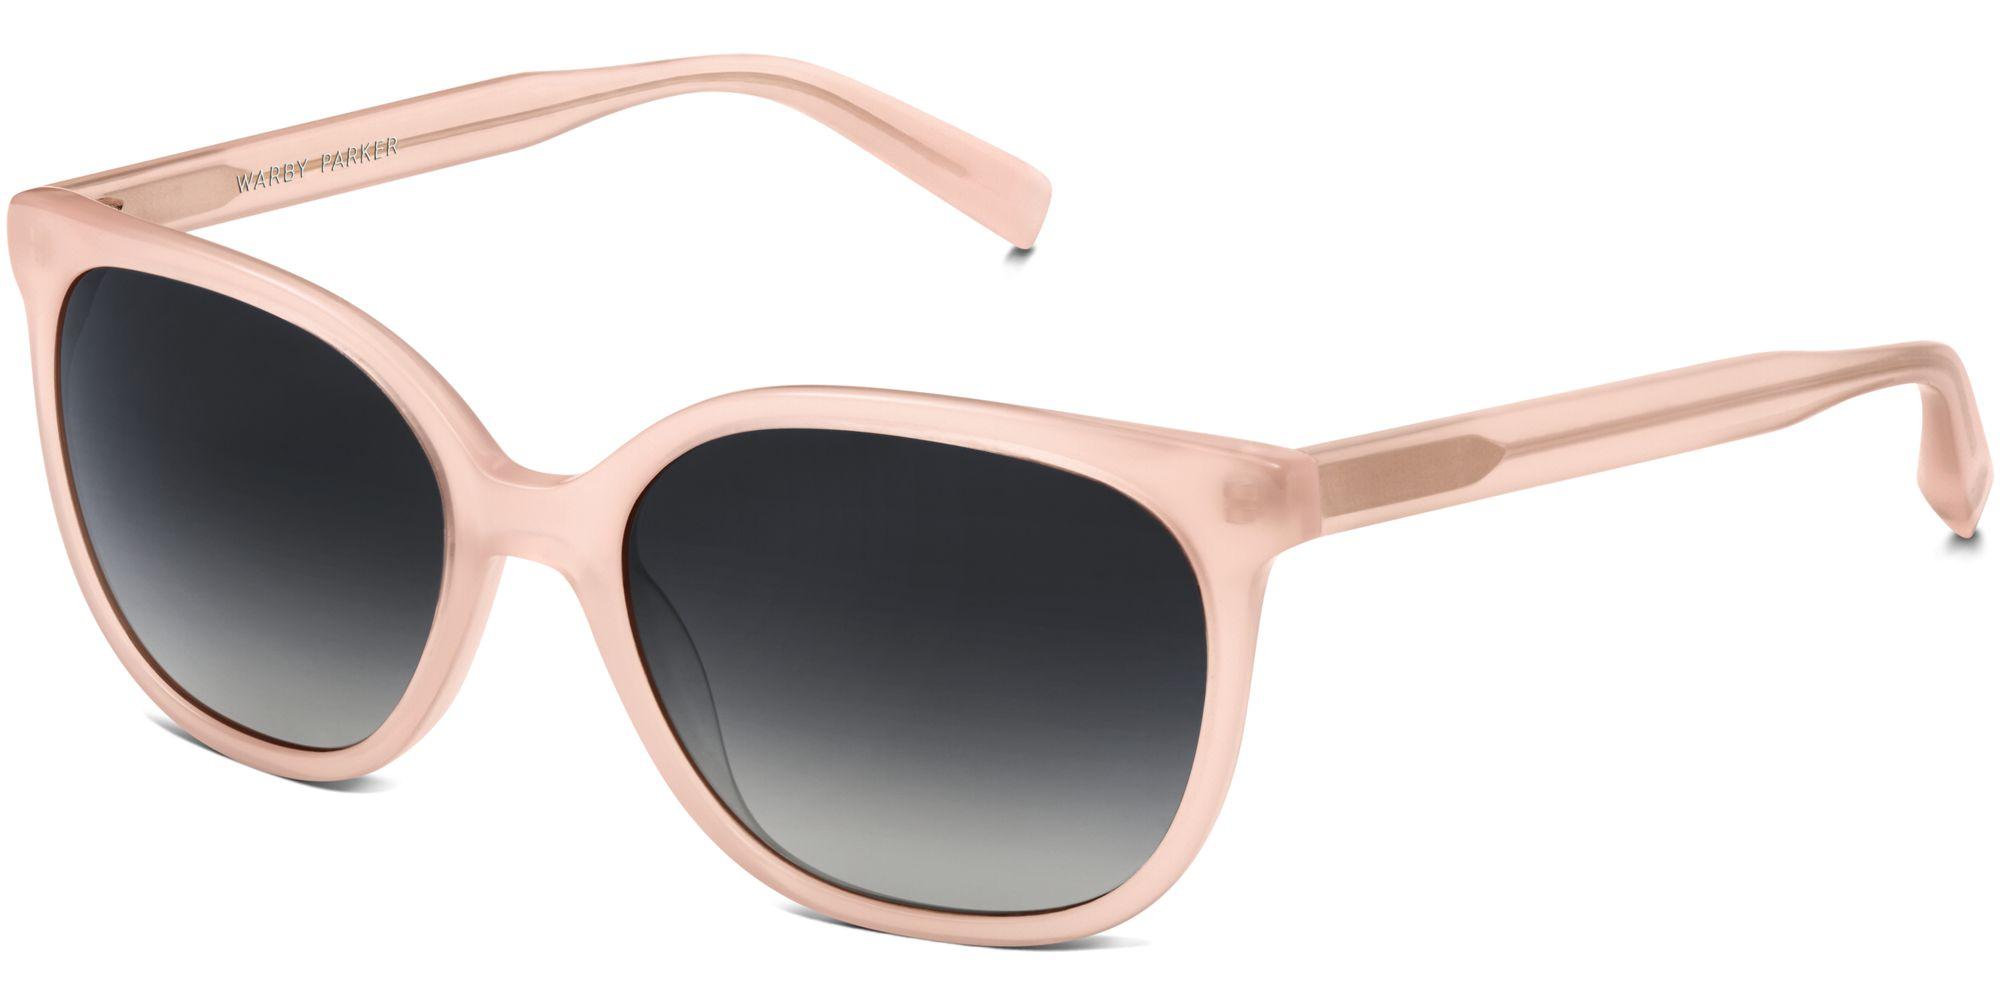 #warbyparker,Warby Parker Sunglasses - Raglan in Himalayan Salt